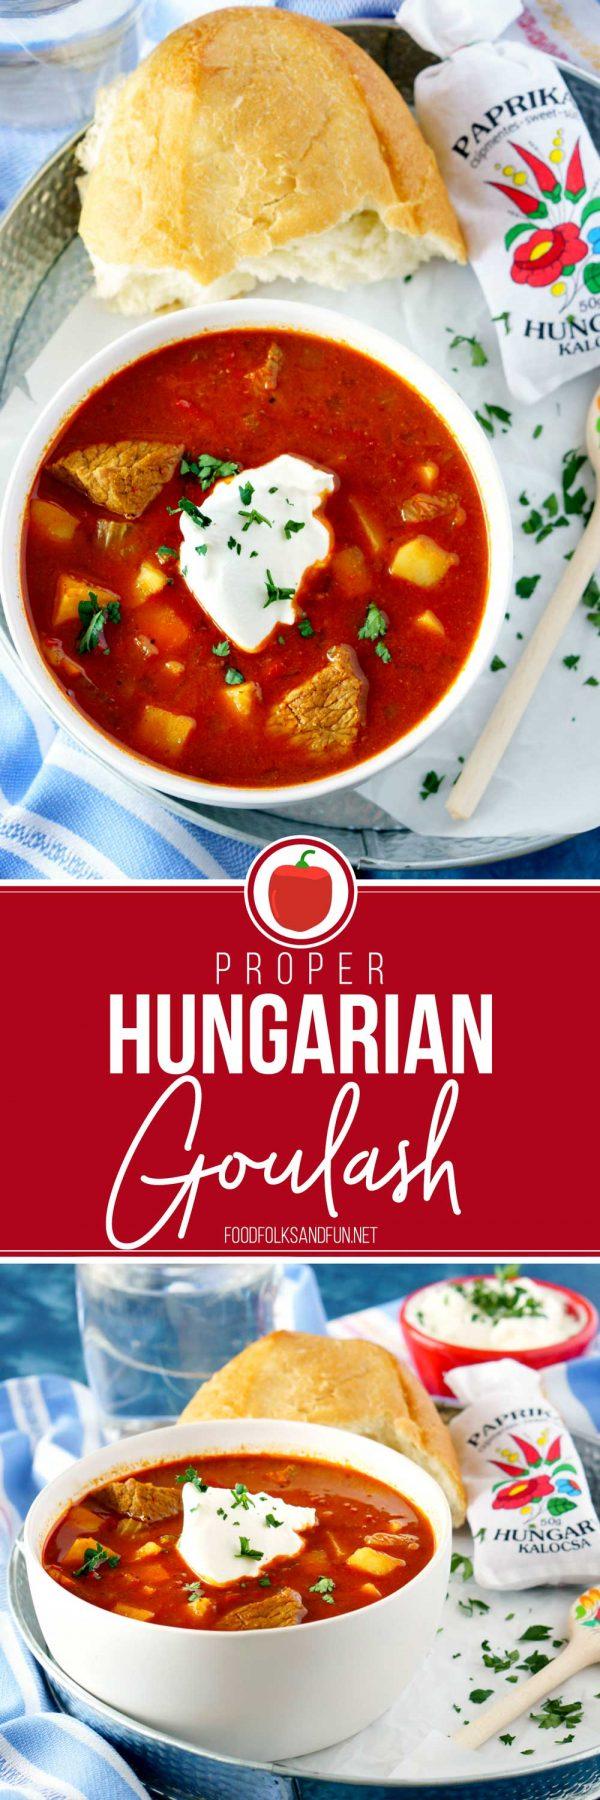 The Best Hungarian Goulash recipe!